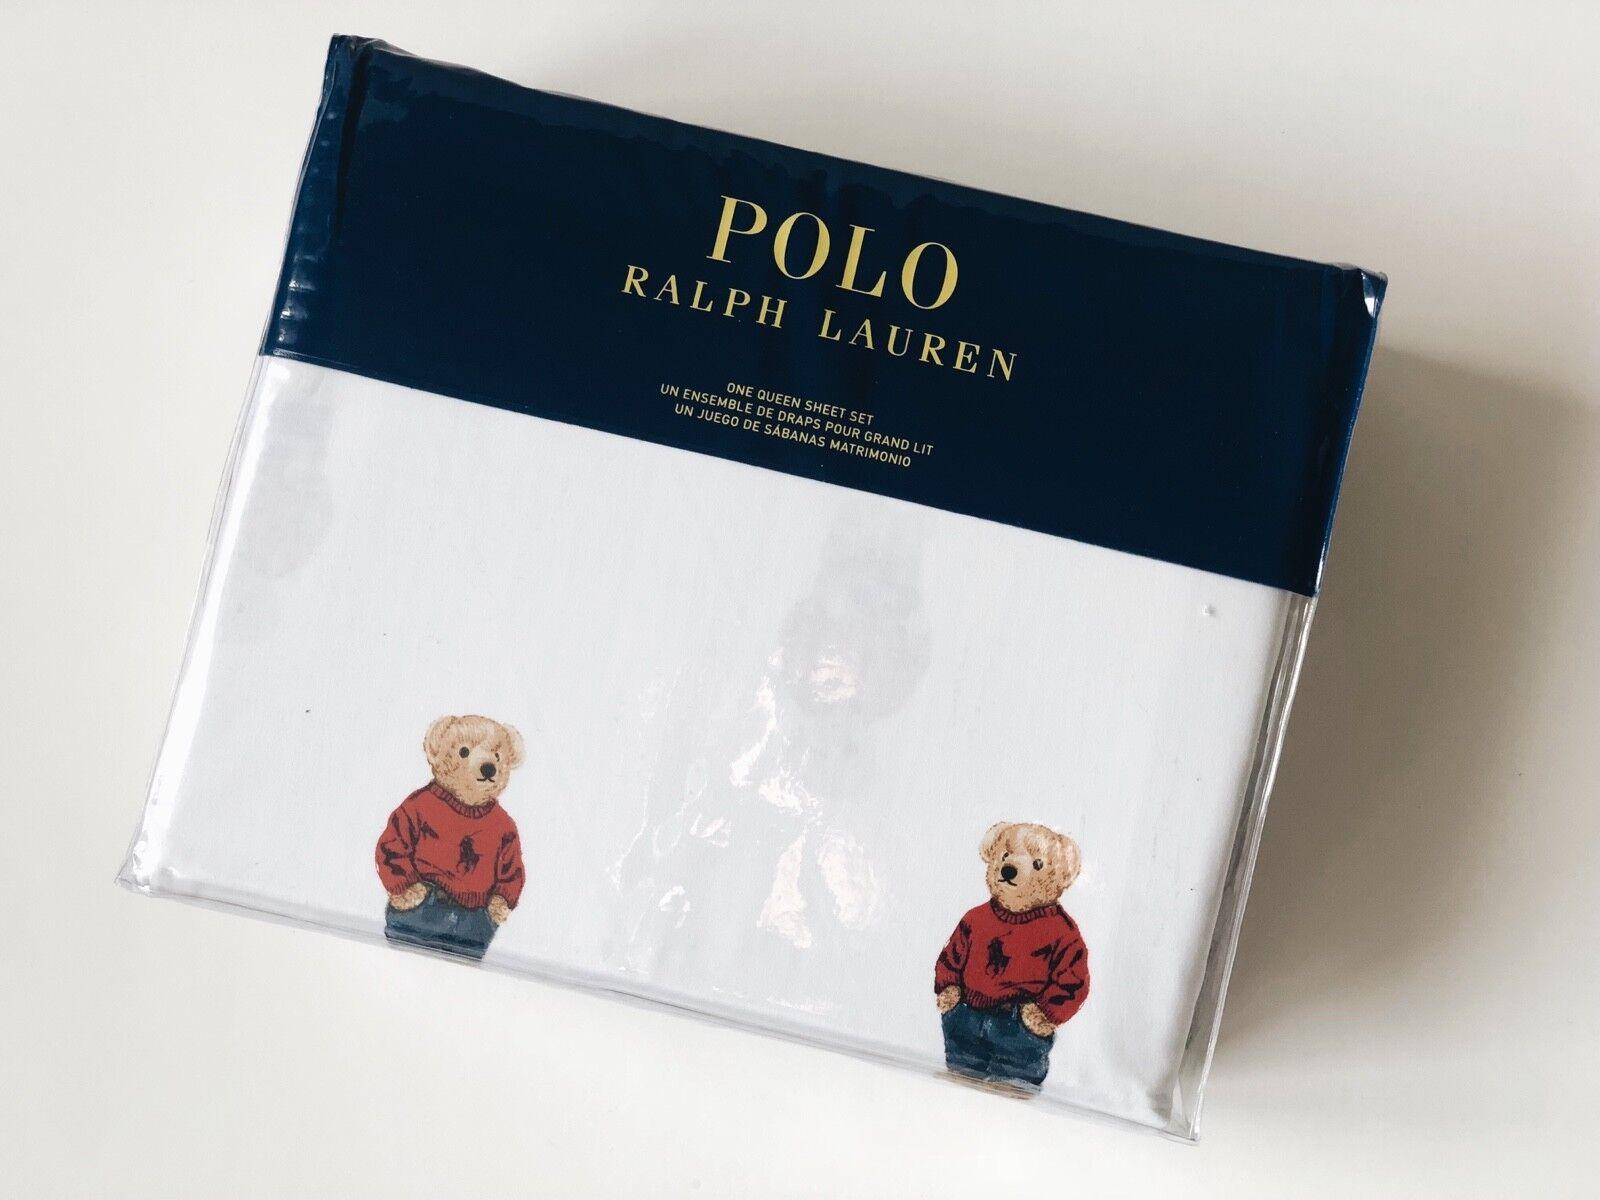 POLO RALPH LAUREN [FULL SHEET] BOY POLO BEAR 4 PIECE SET WHITE PILLOW CASE NEW